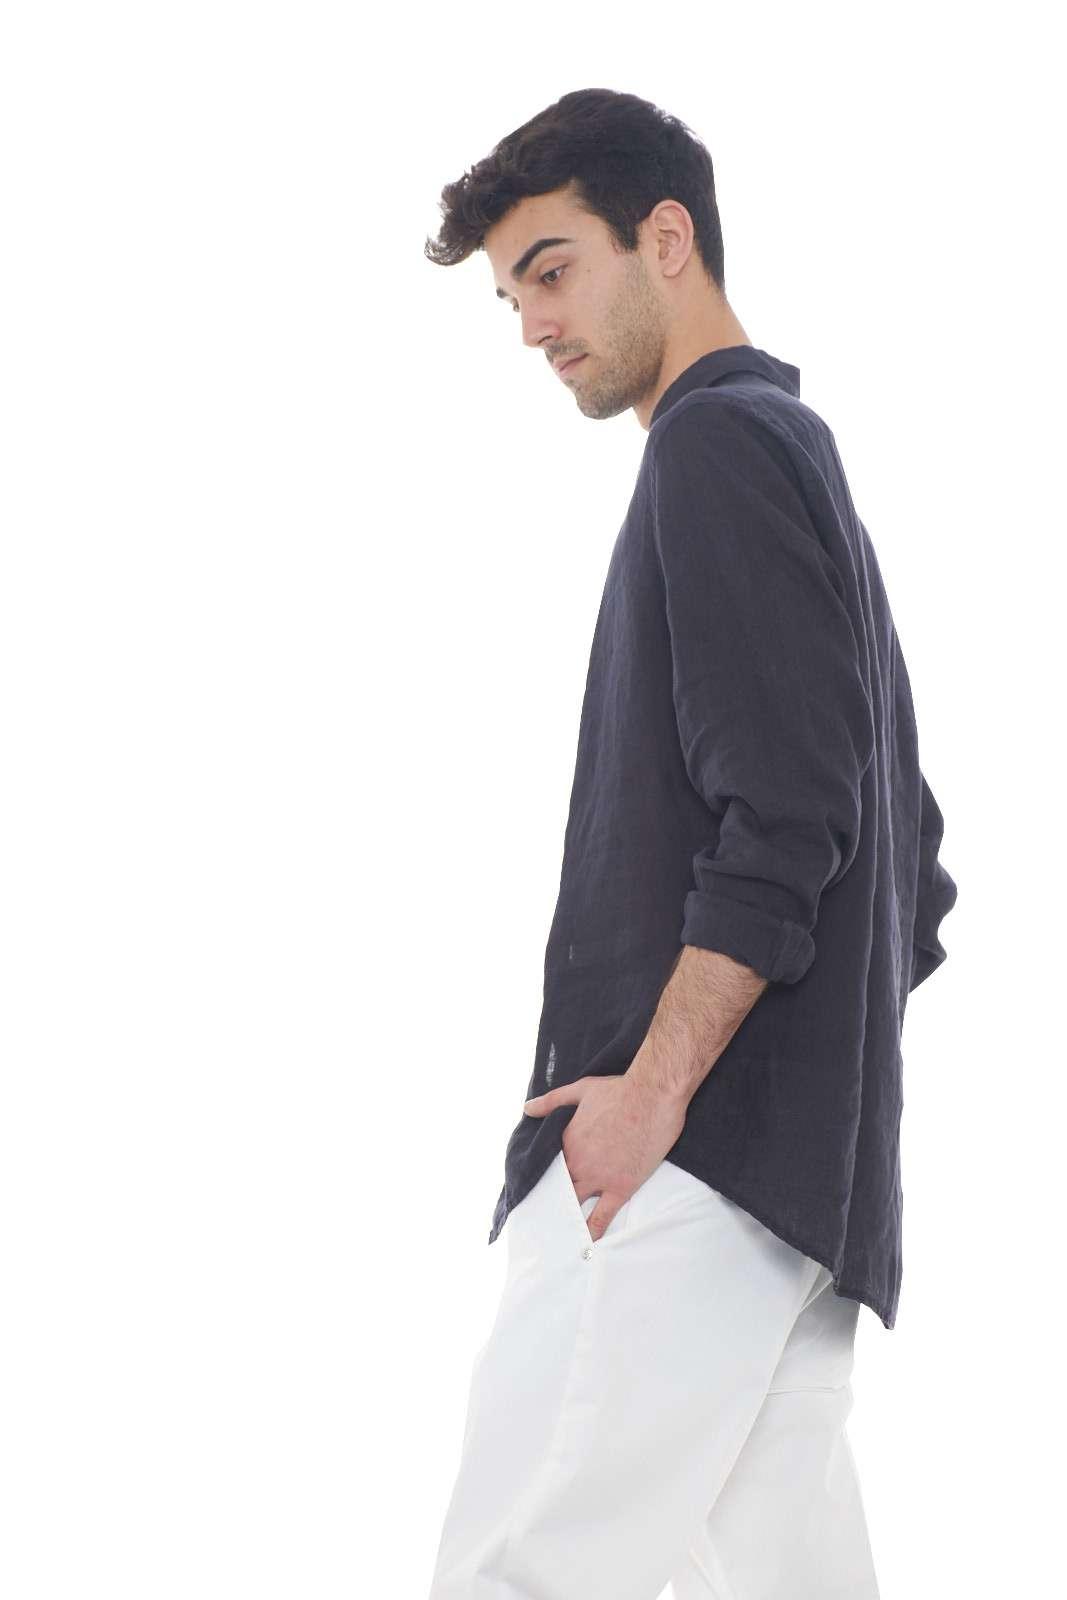 https://www.parmax.com/media/catalog/product/a/i/PE-outlet_parmax-camicia-uomo-Altea-1954000-B_1.jpg